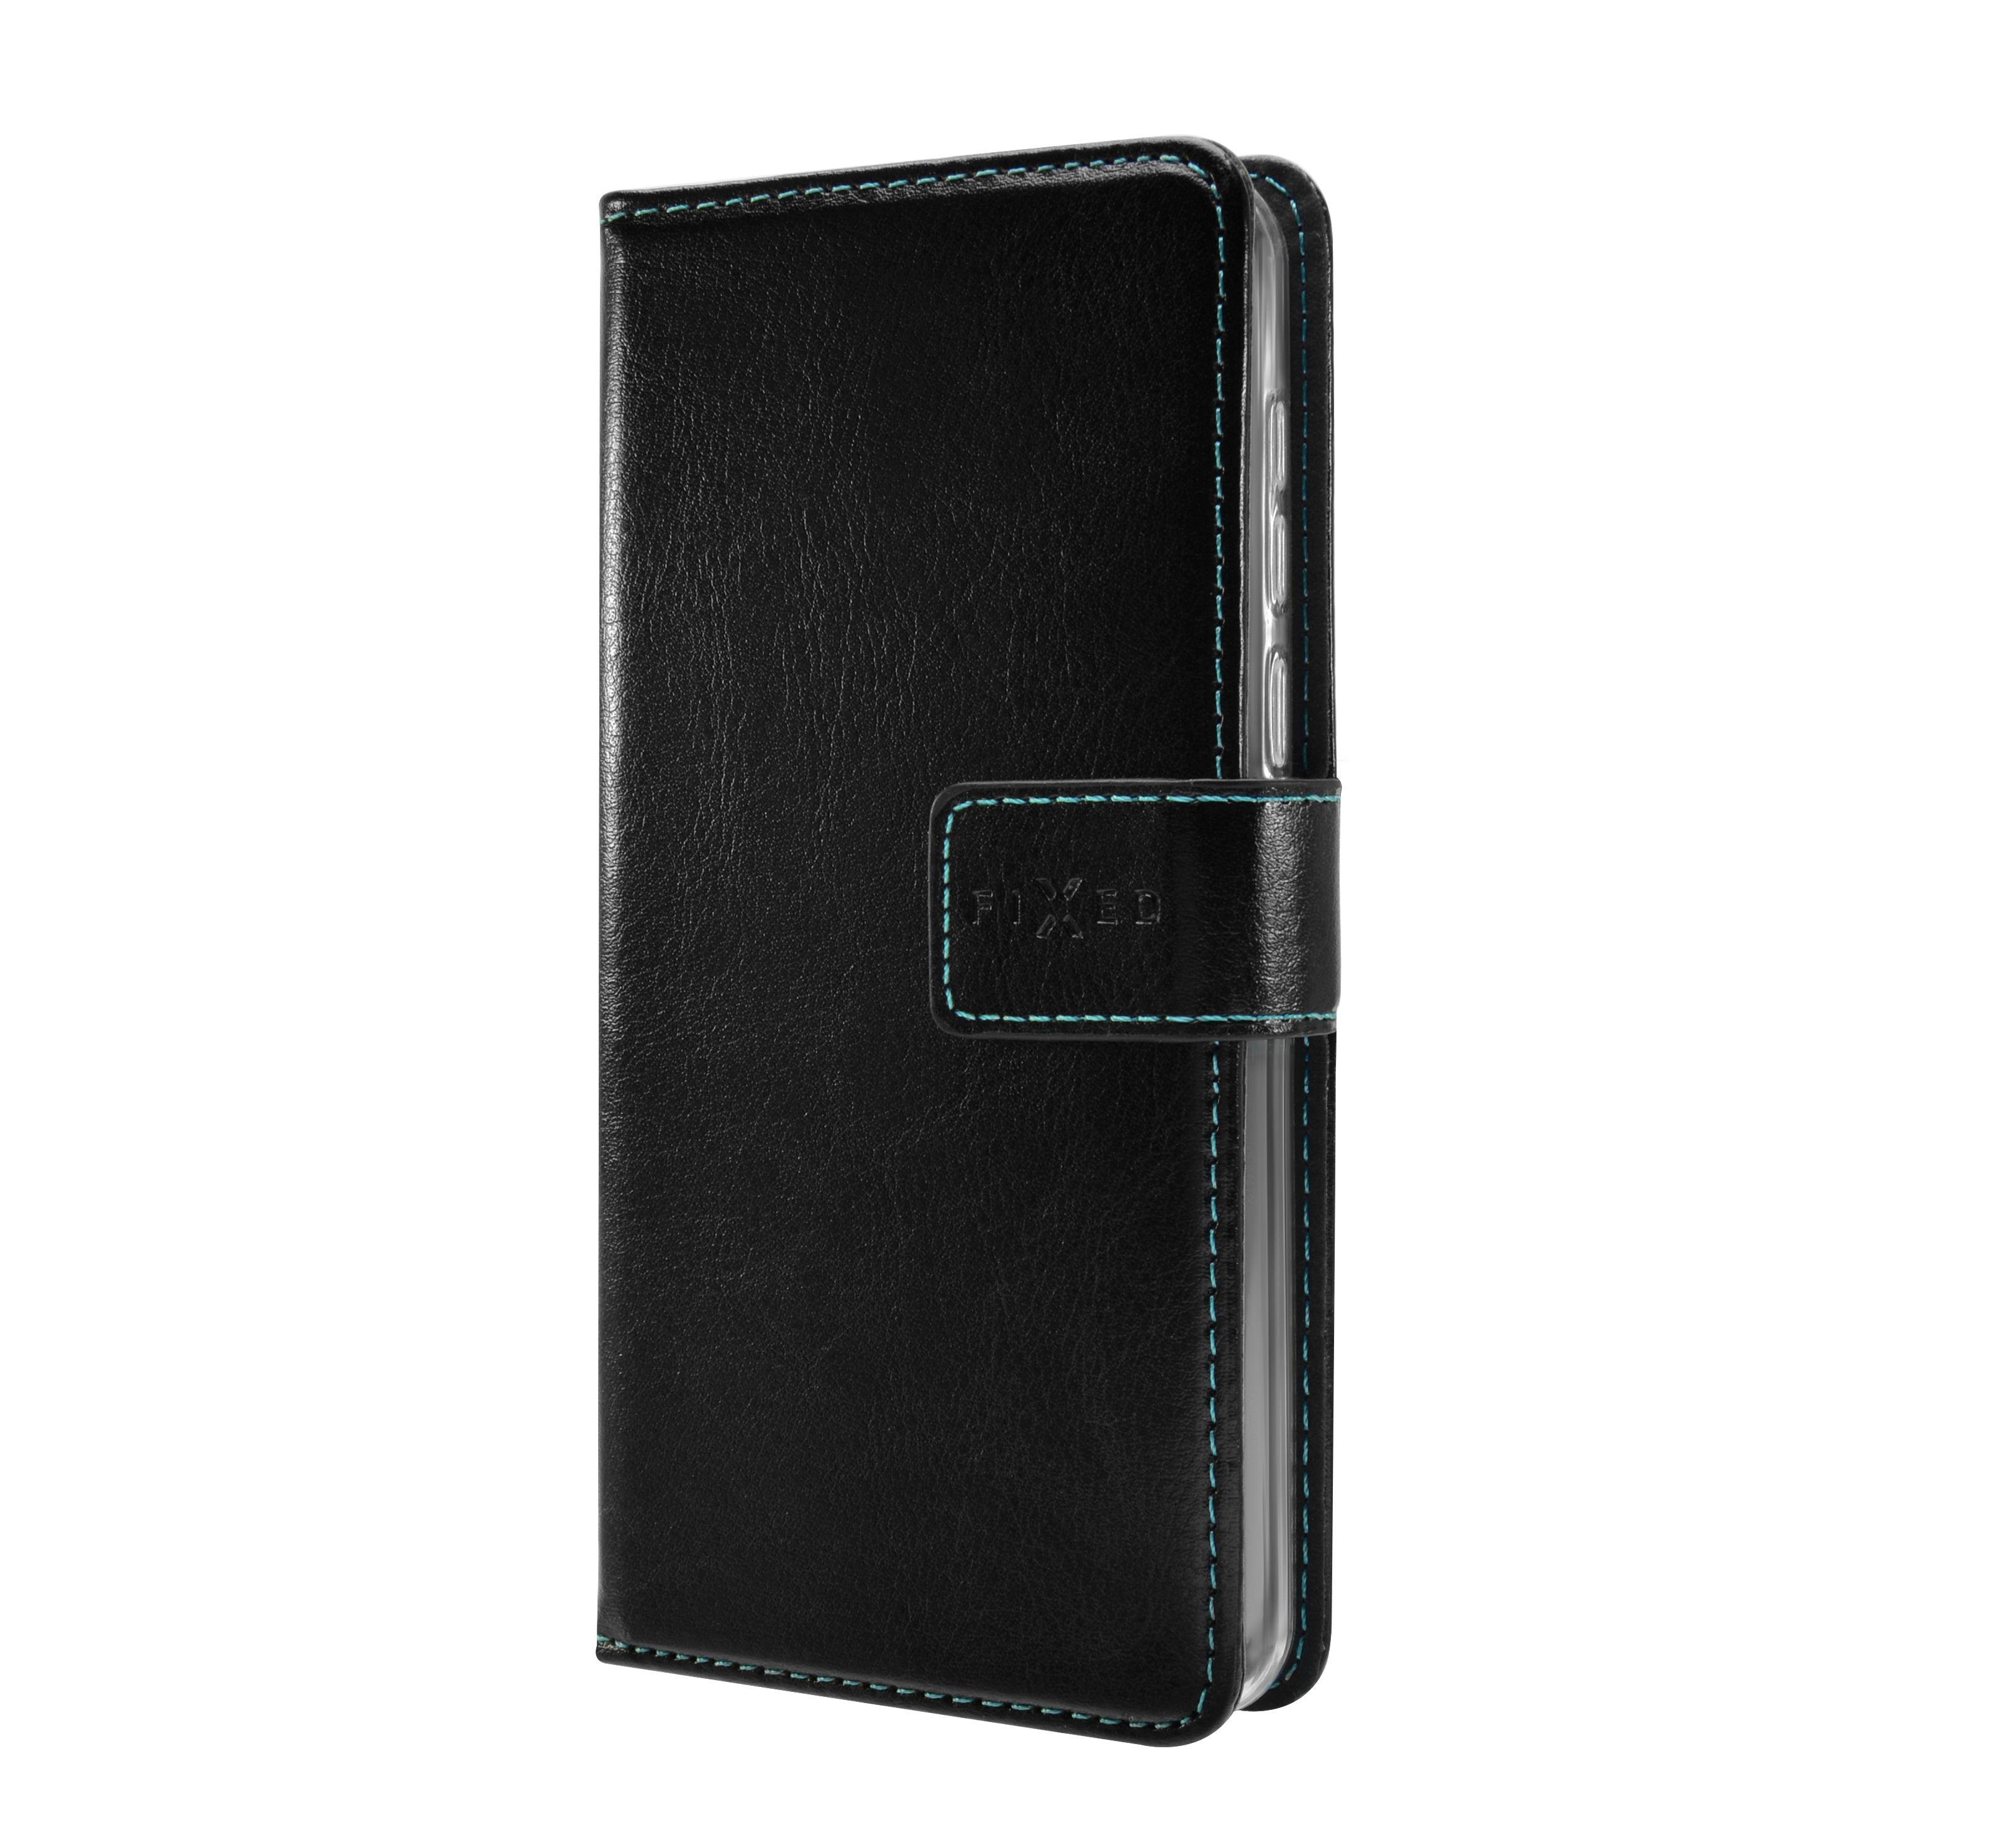 Pouzdro typu kniha FIXED Opus pro Vodafone Smart X9, černé